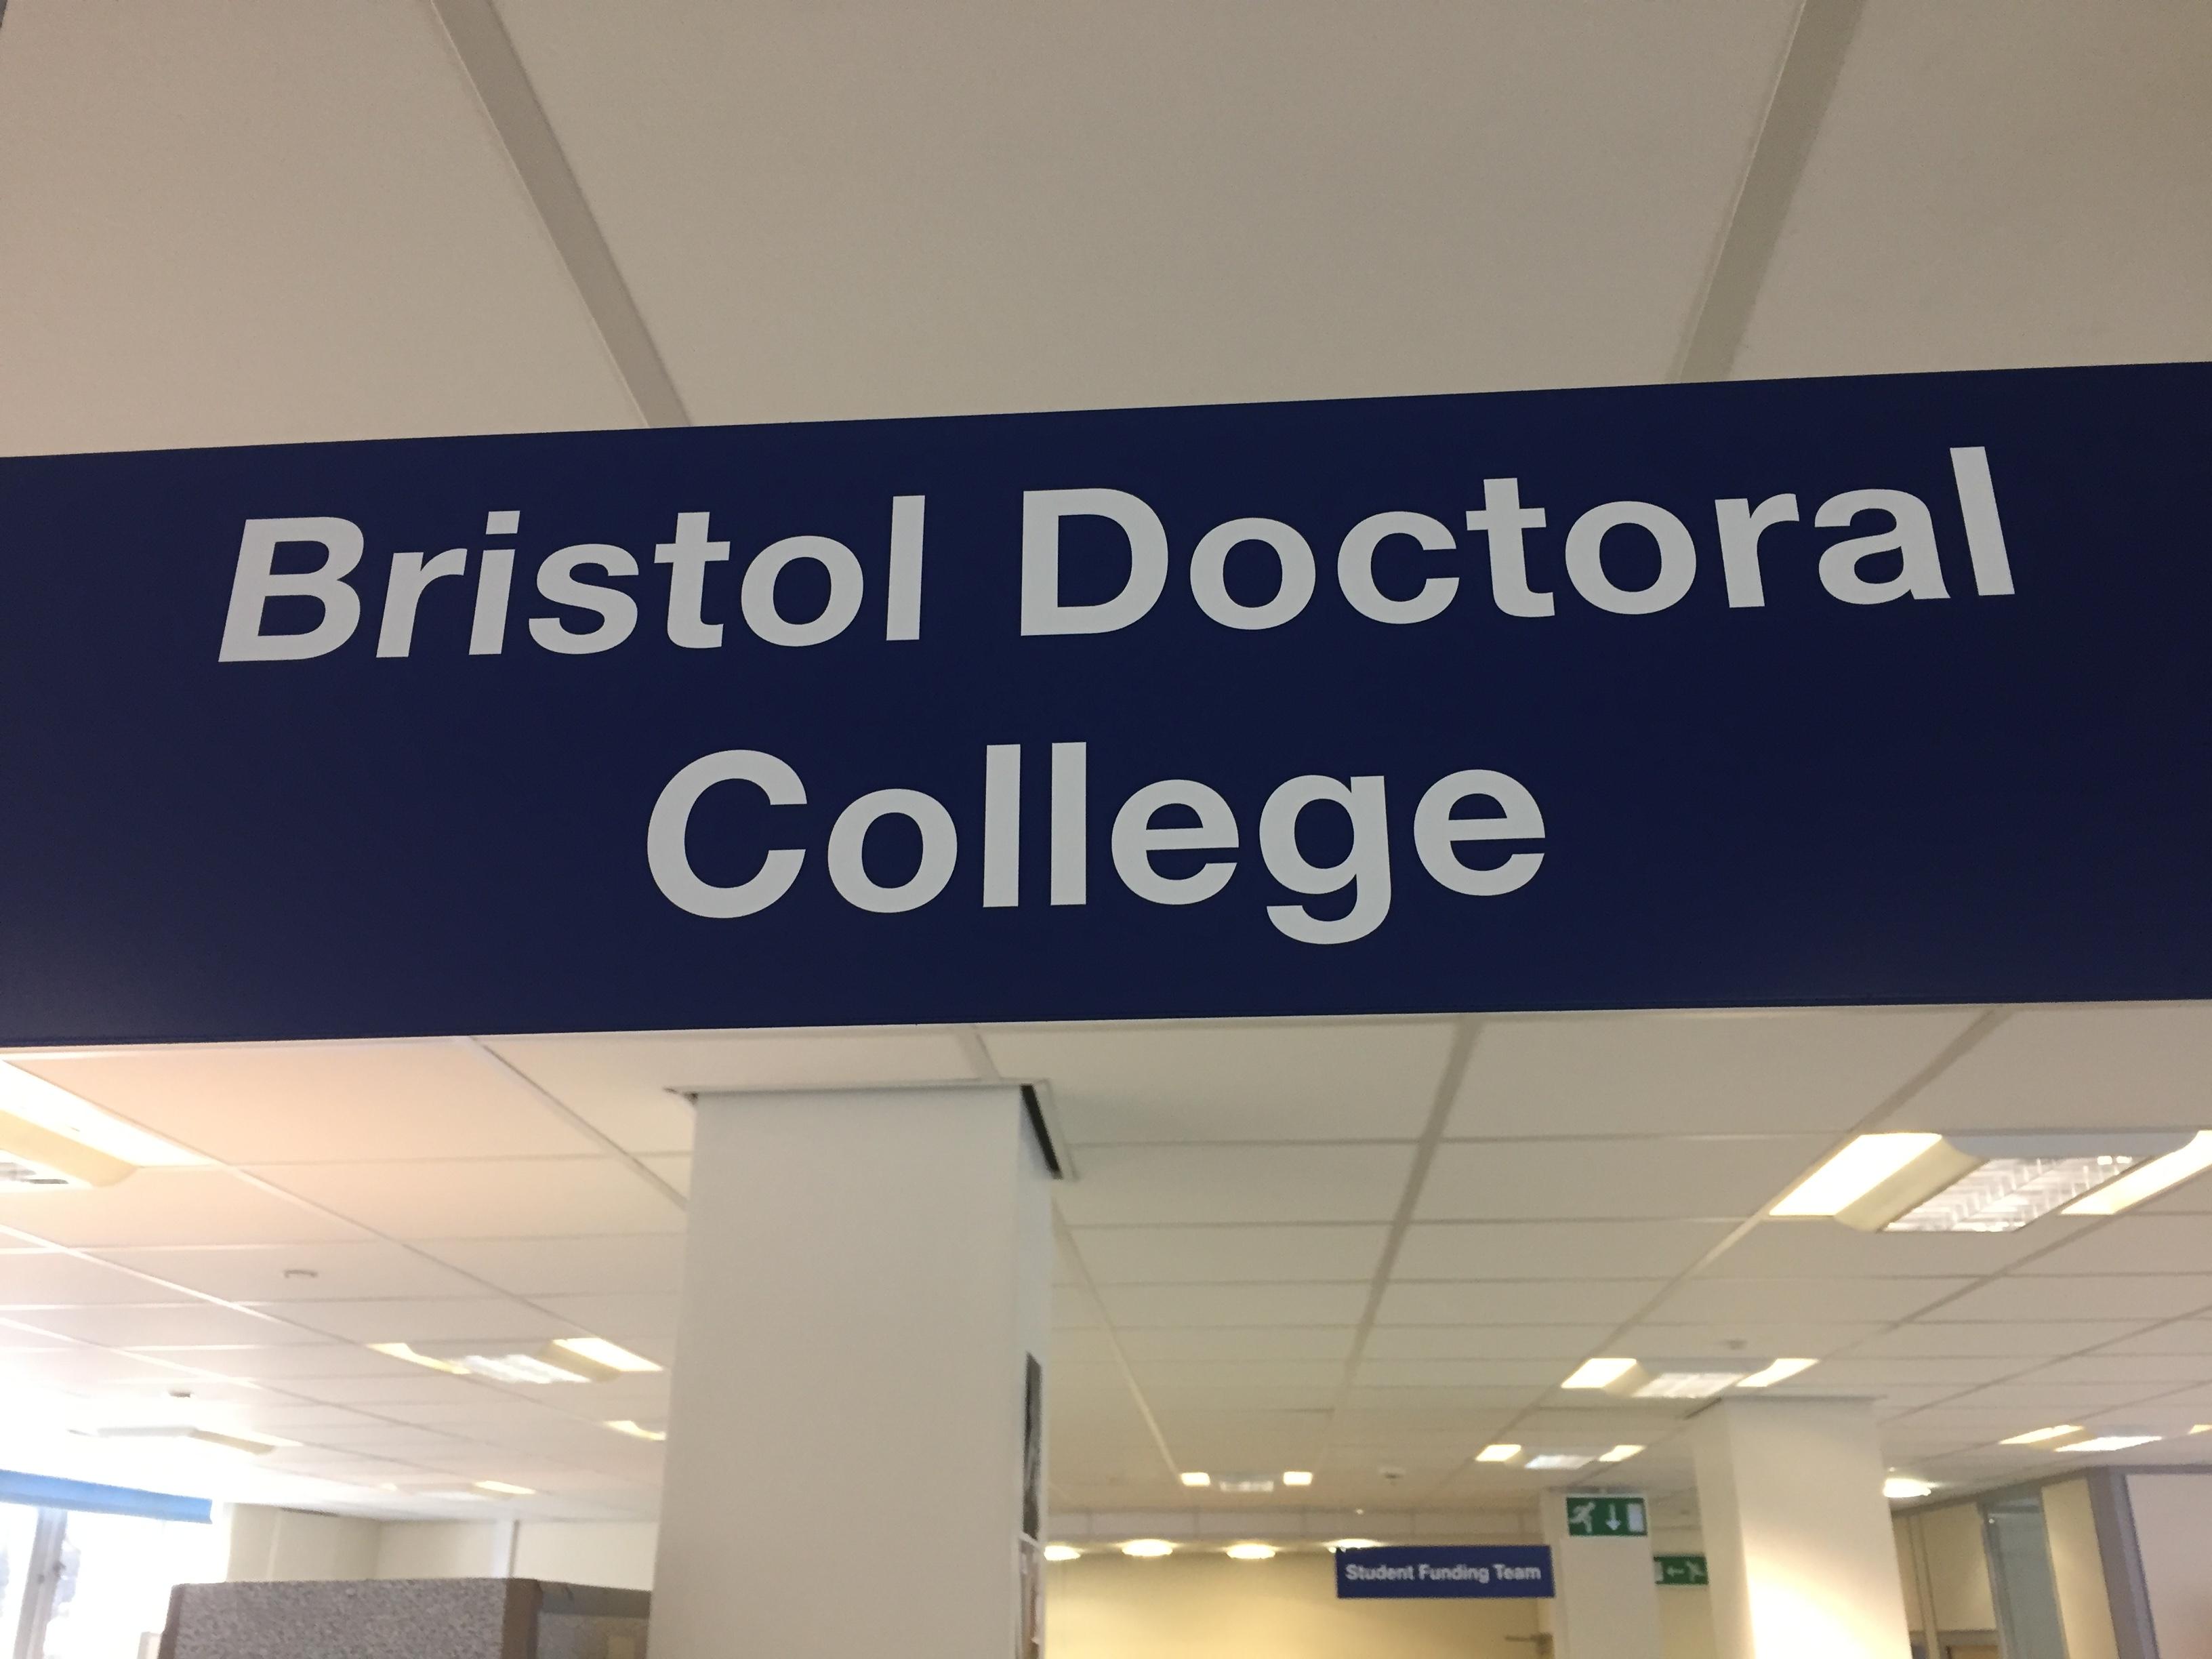 Bristol Doctoral Collegethedigitaldoctorate